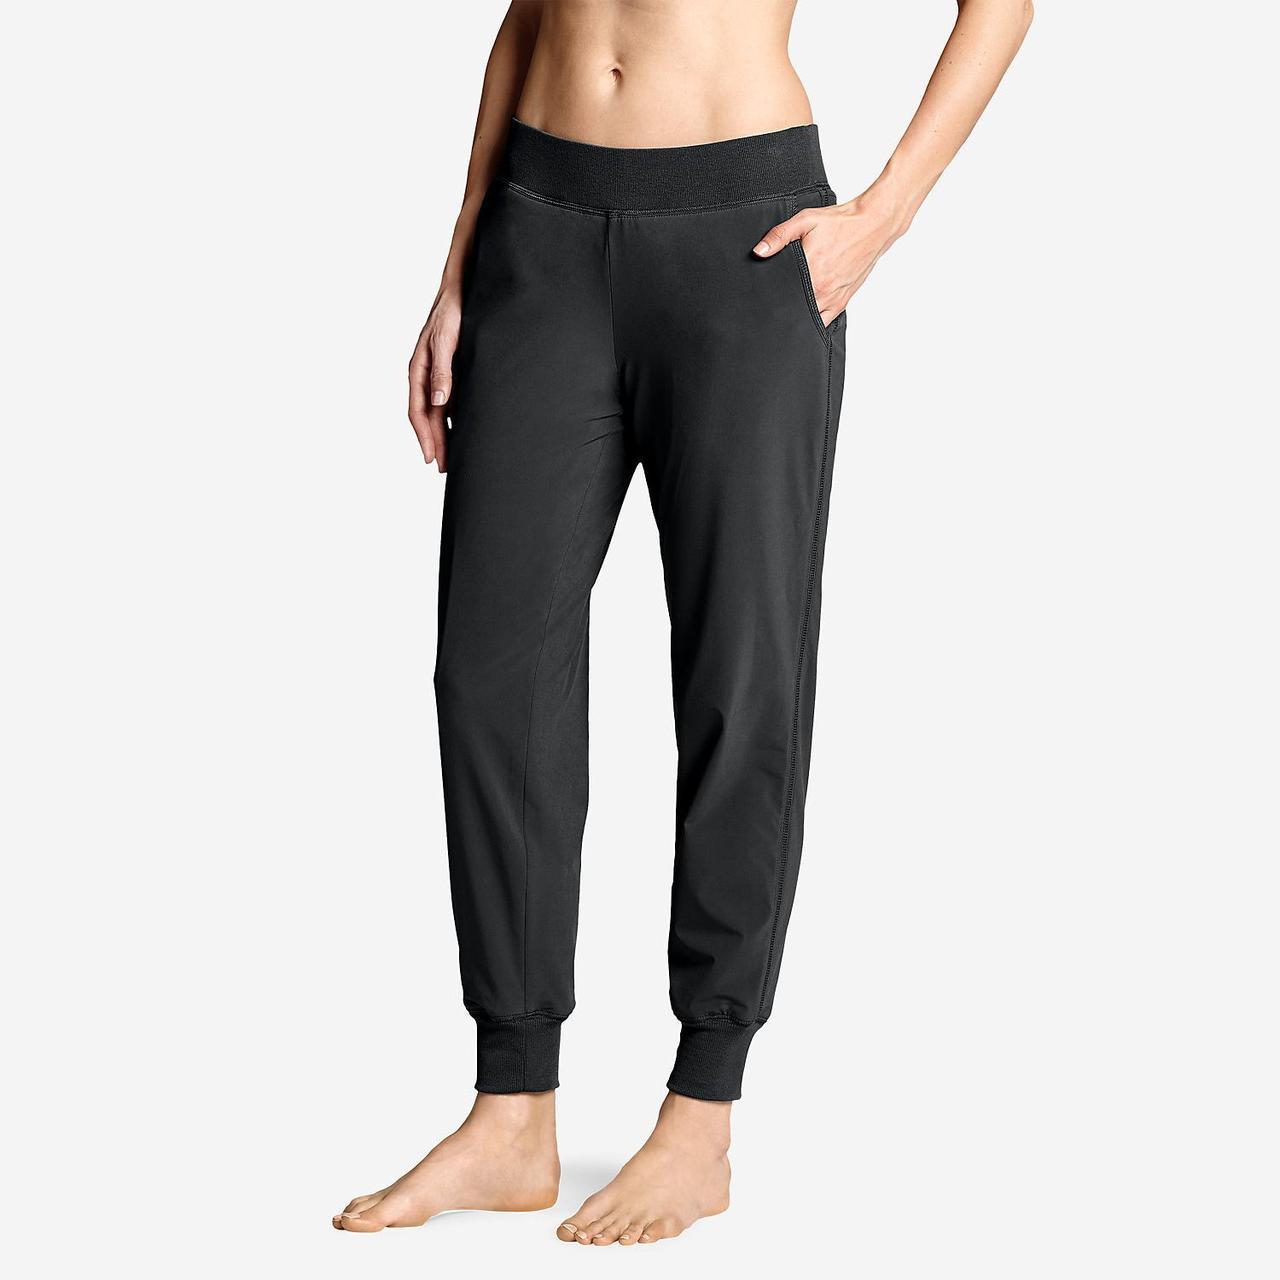 Спортивные брюки Eddie Bauer Women Myriad Lined Jogger DK  SMOKE